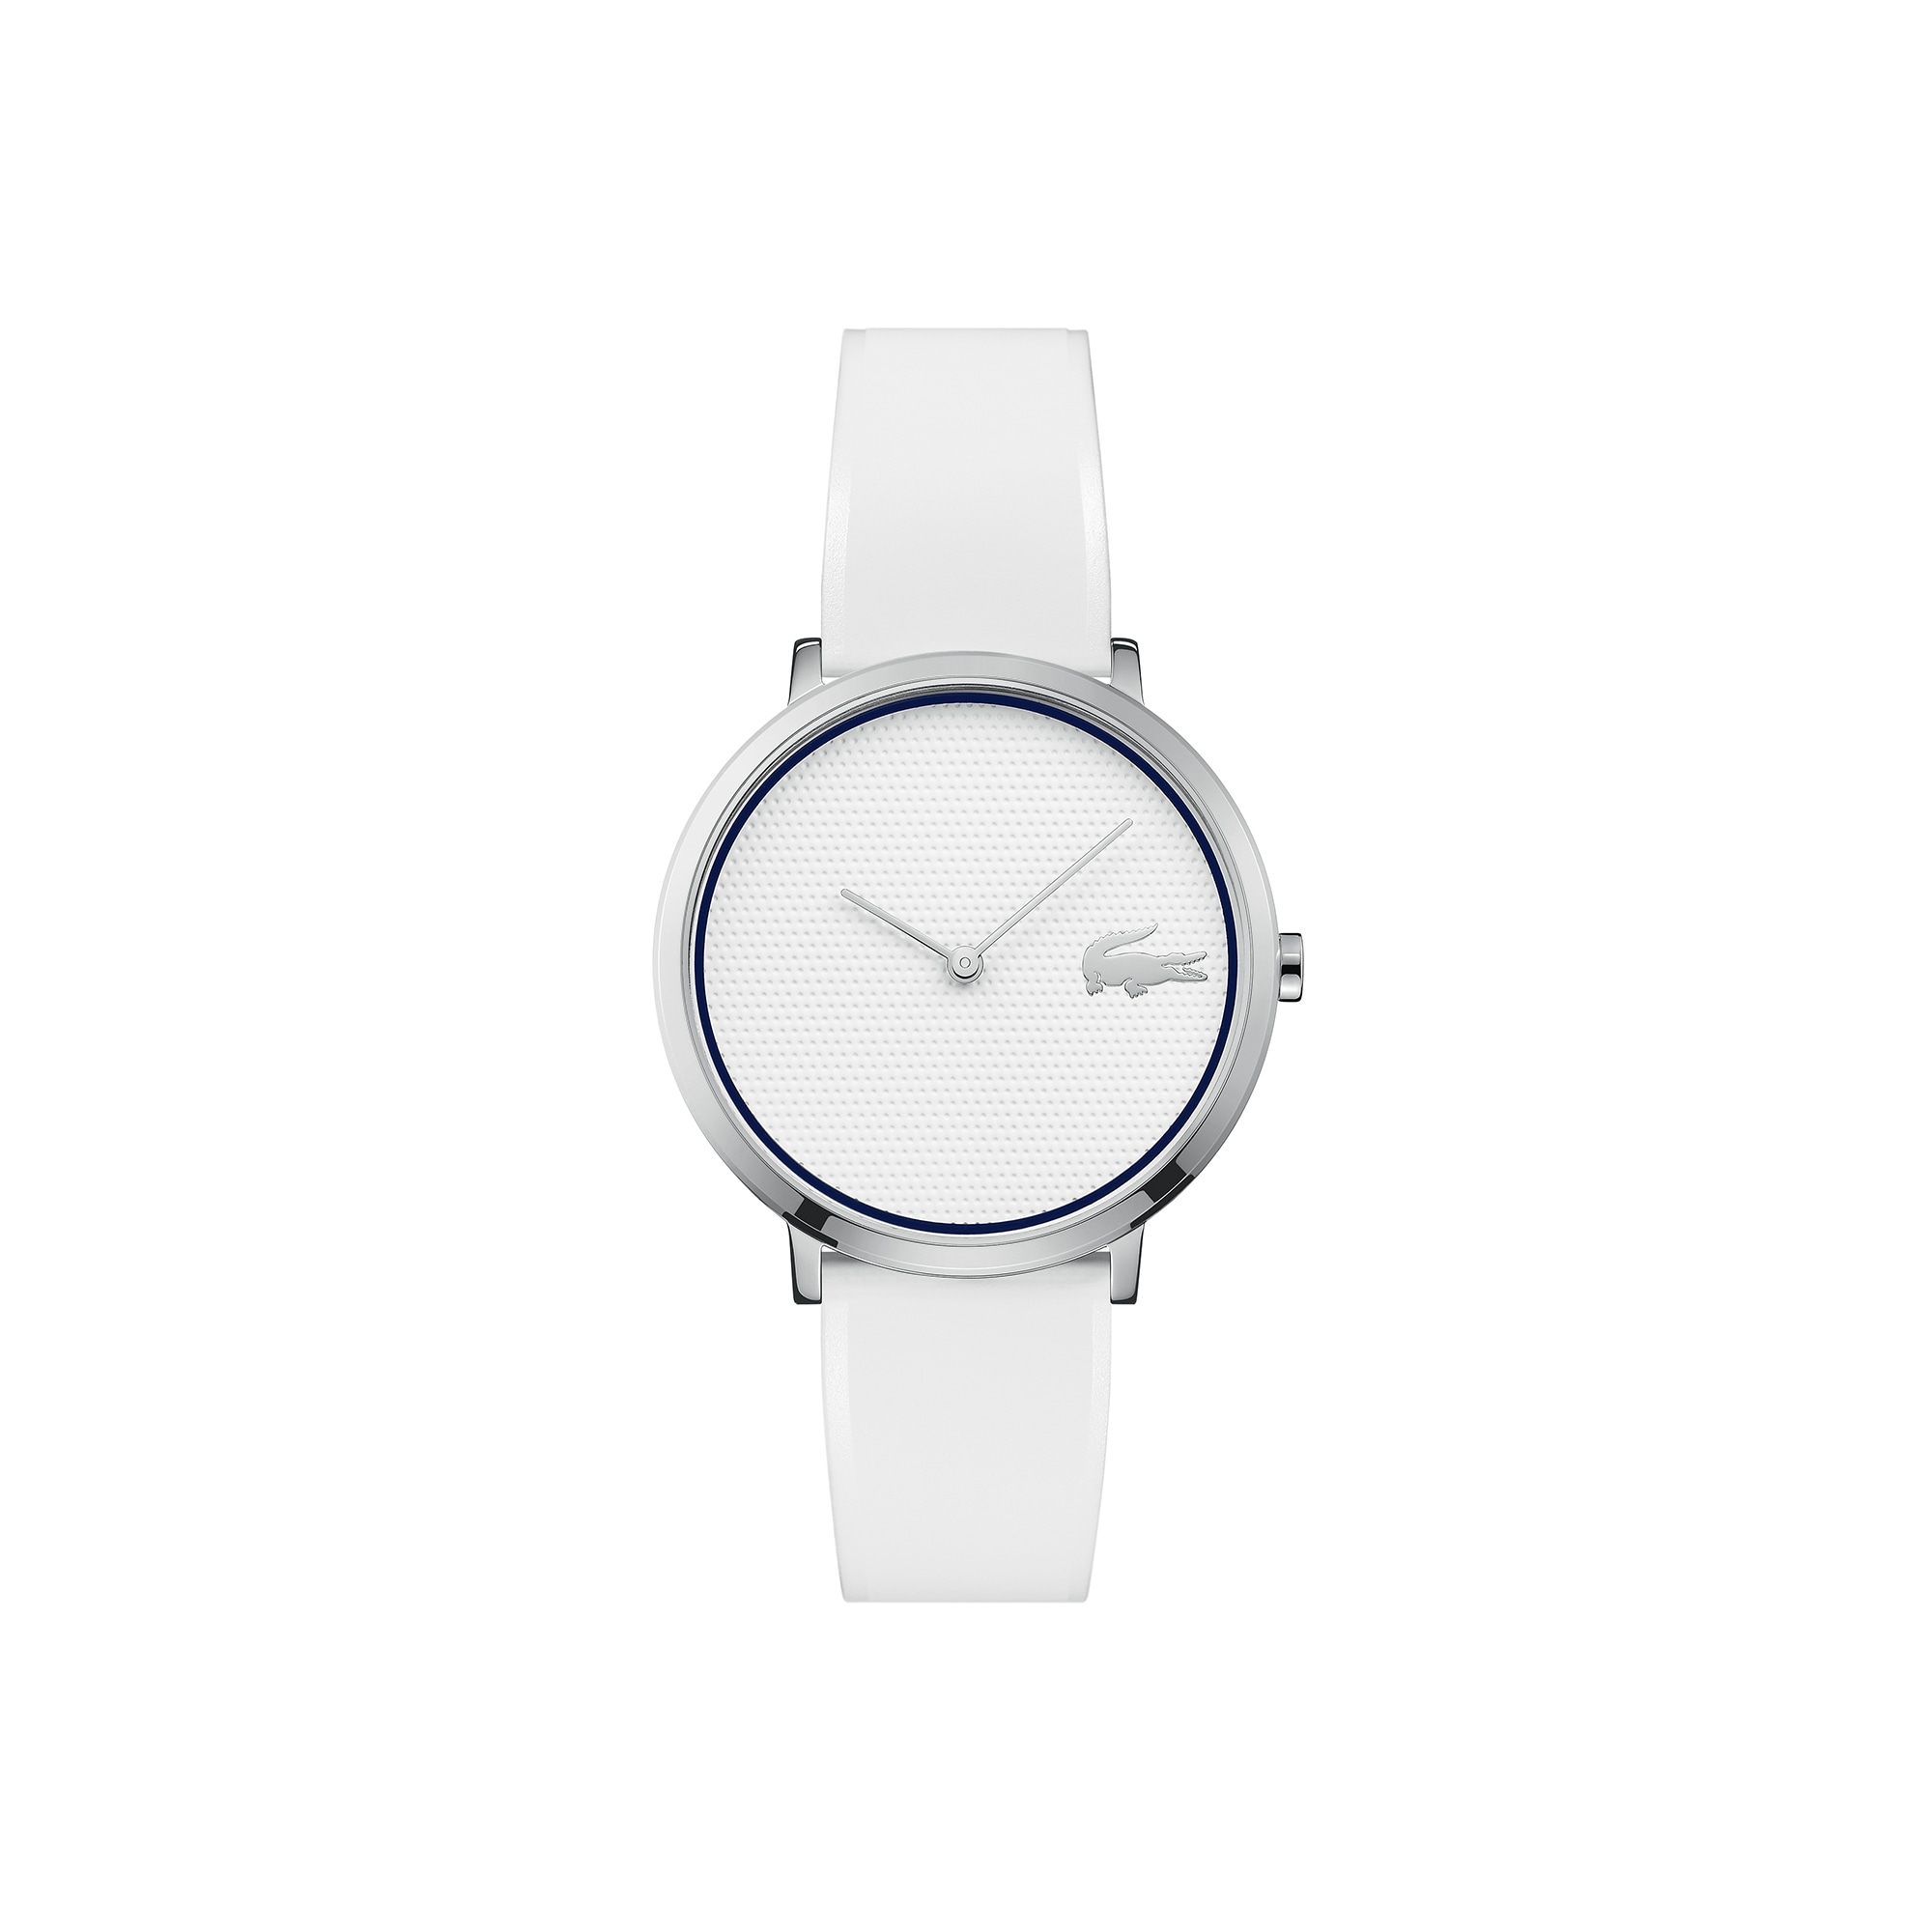 Reloj de Mujer Moon Golf Ultrafino con Correa de Silicona Blanca